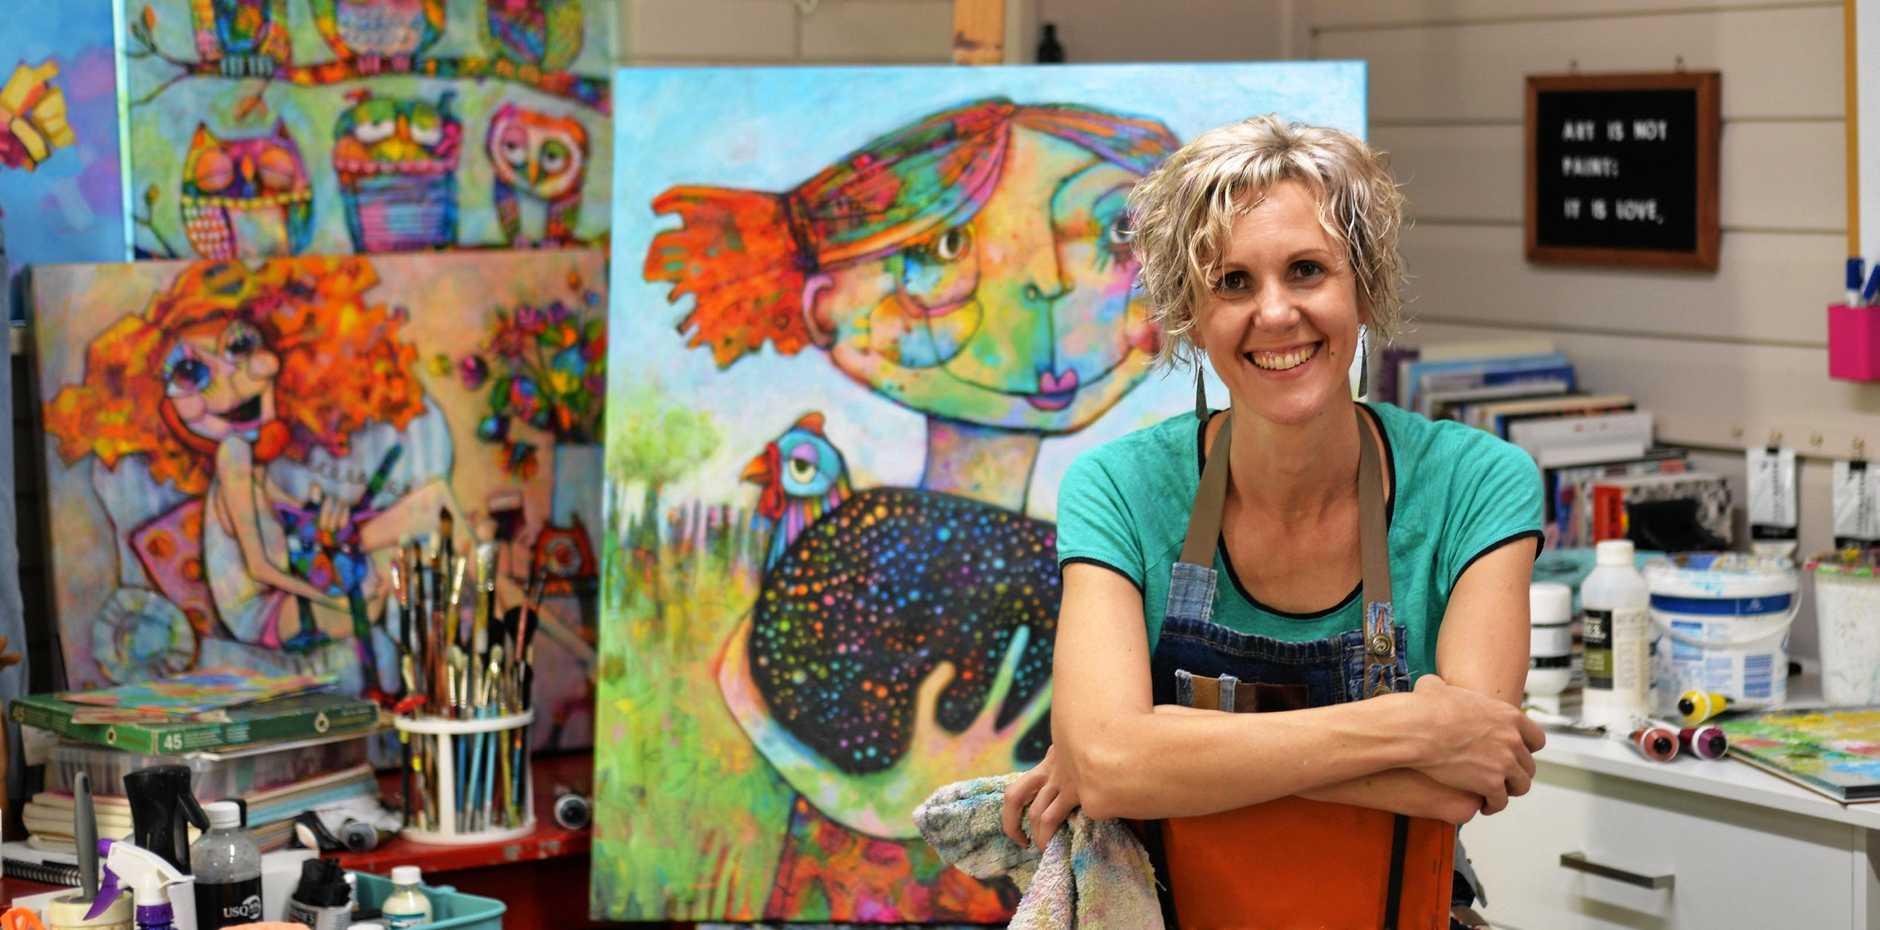 ART SHOW: Teresa Mundt is set to exhibit her work at the Glennie Community Art Show.